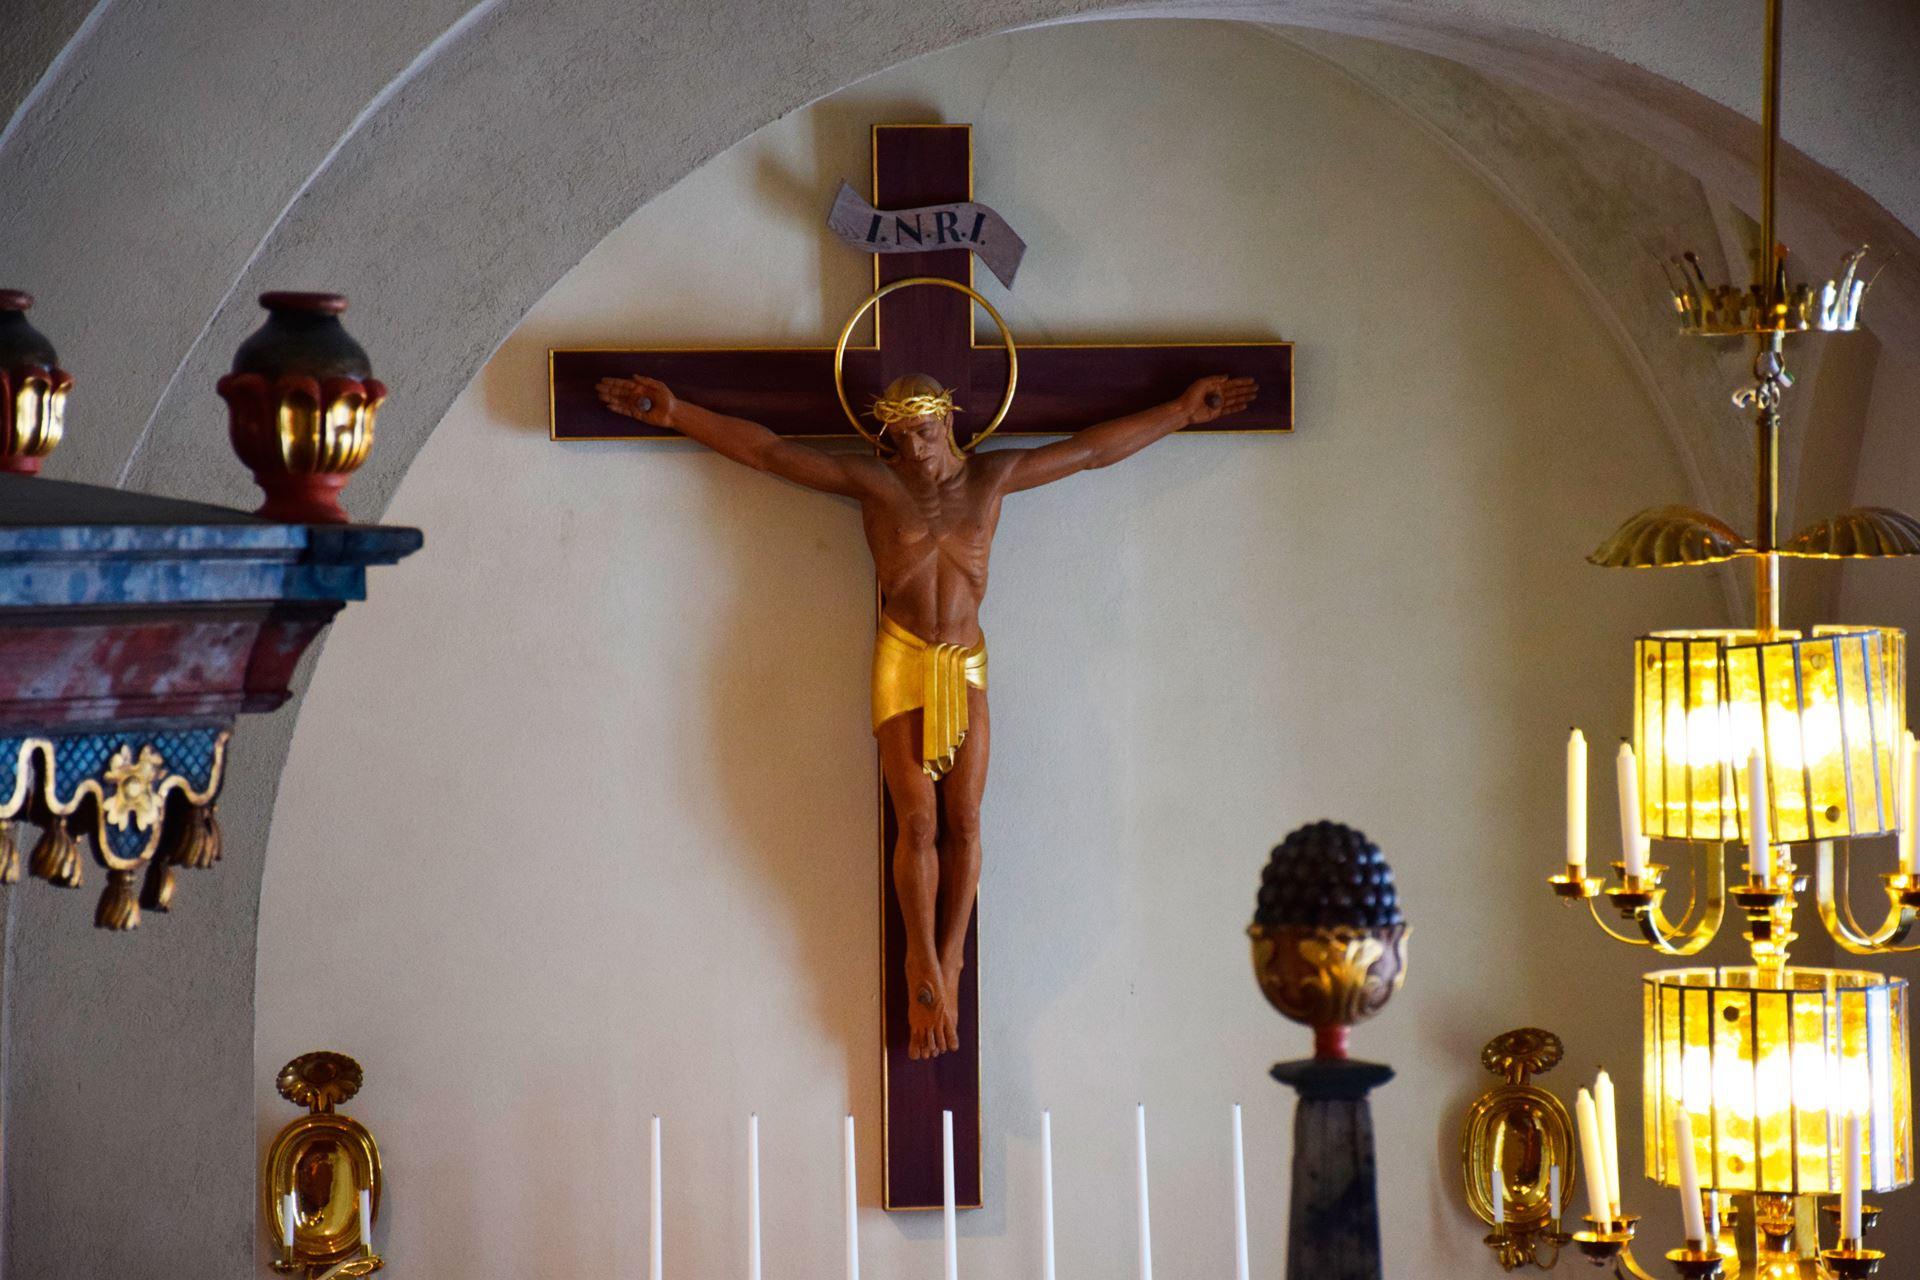 © Ådalsbygdens pastorat, Dals kyrka